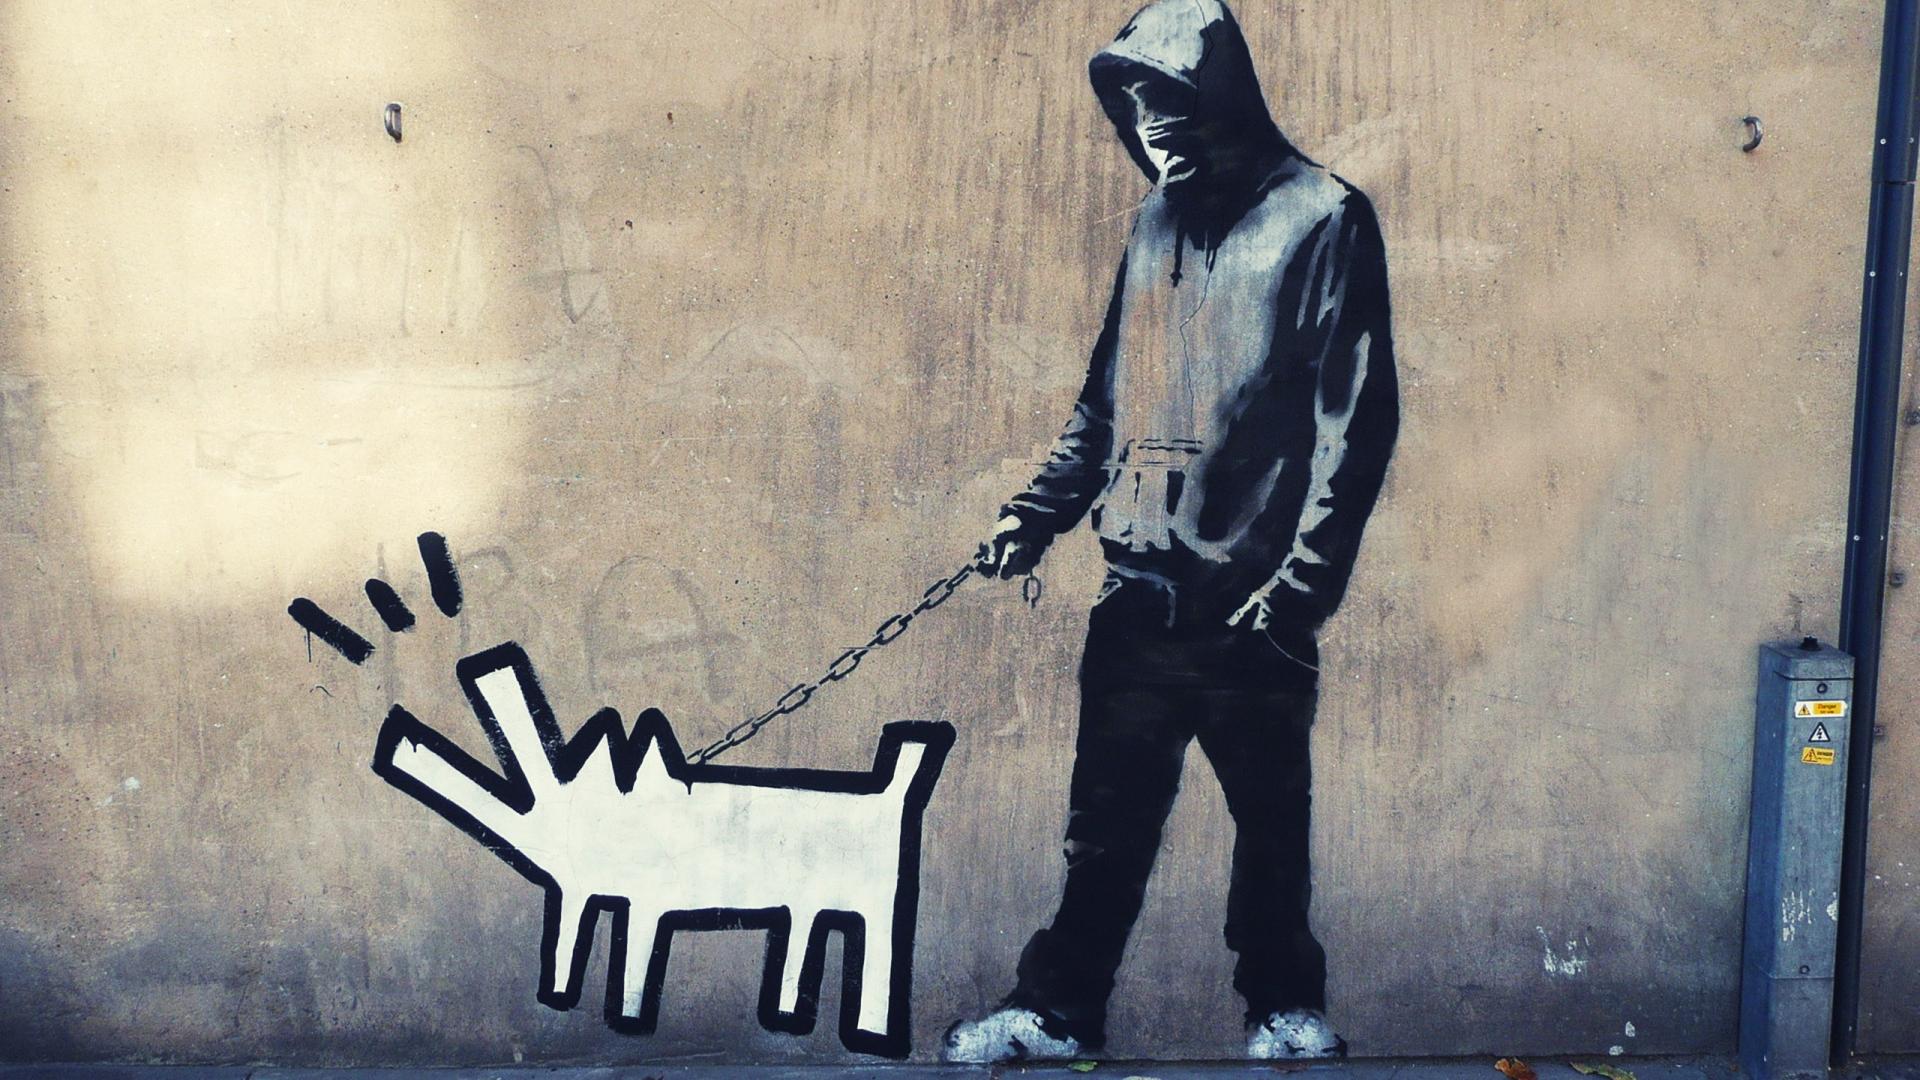 Graffiti-art-paint-urban-hip-1920x1080-UP-wallpaper-wp3406349